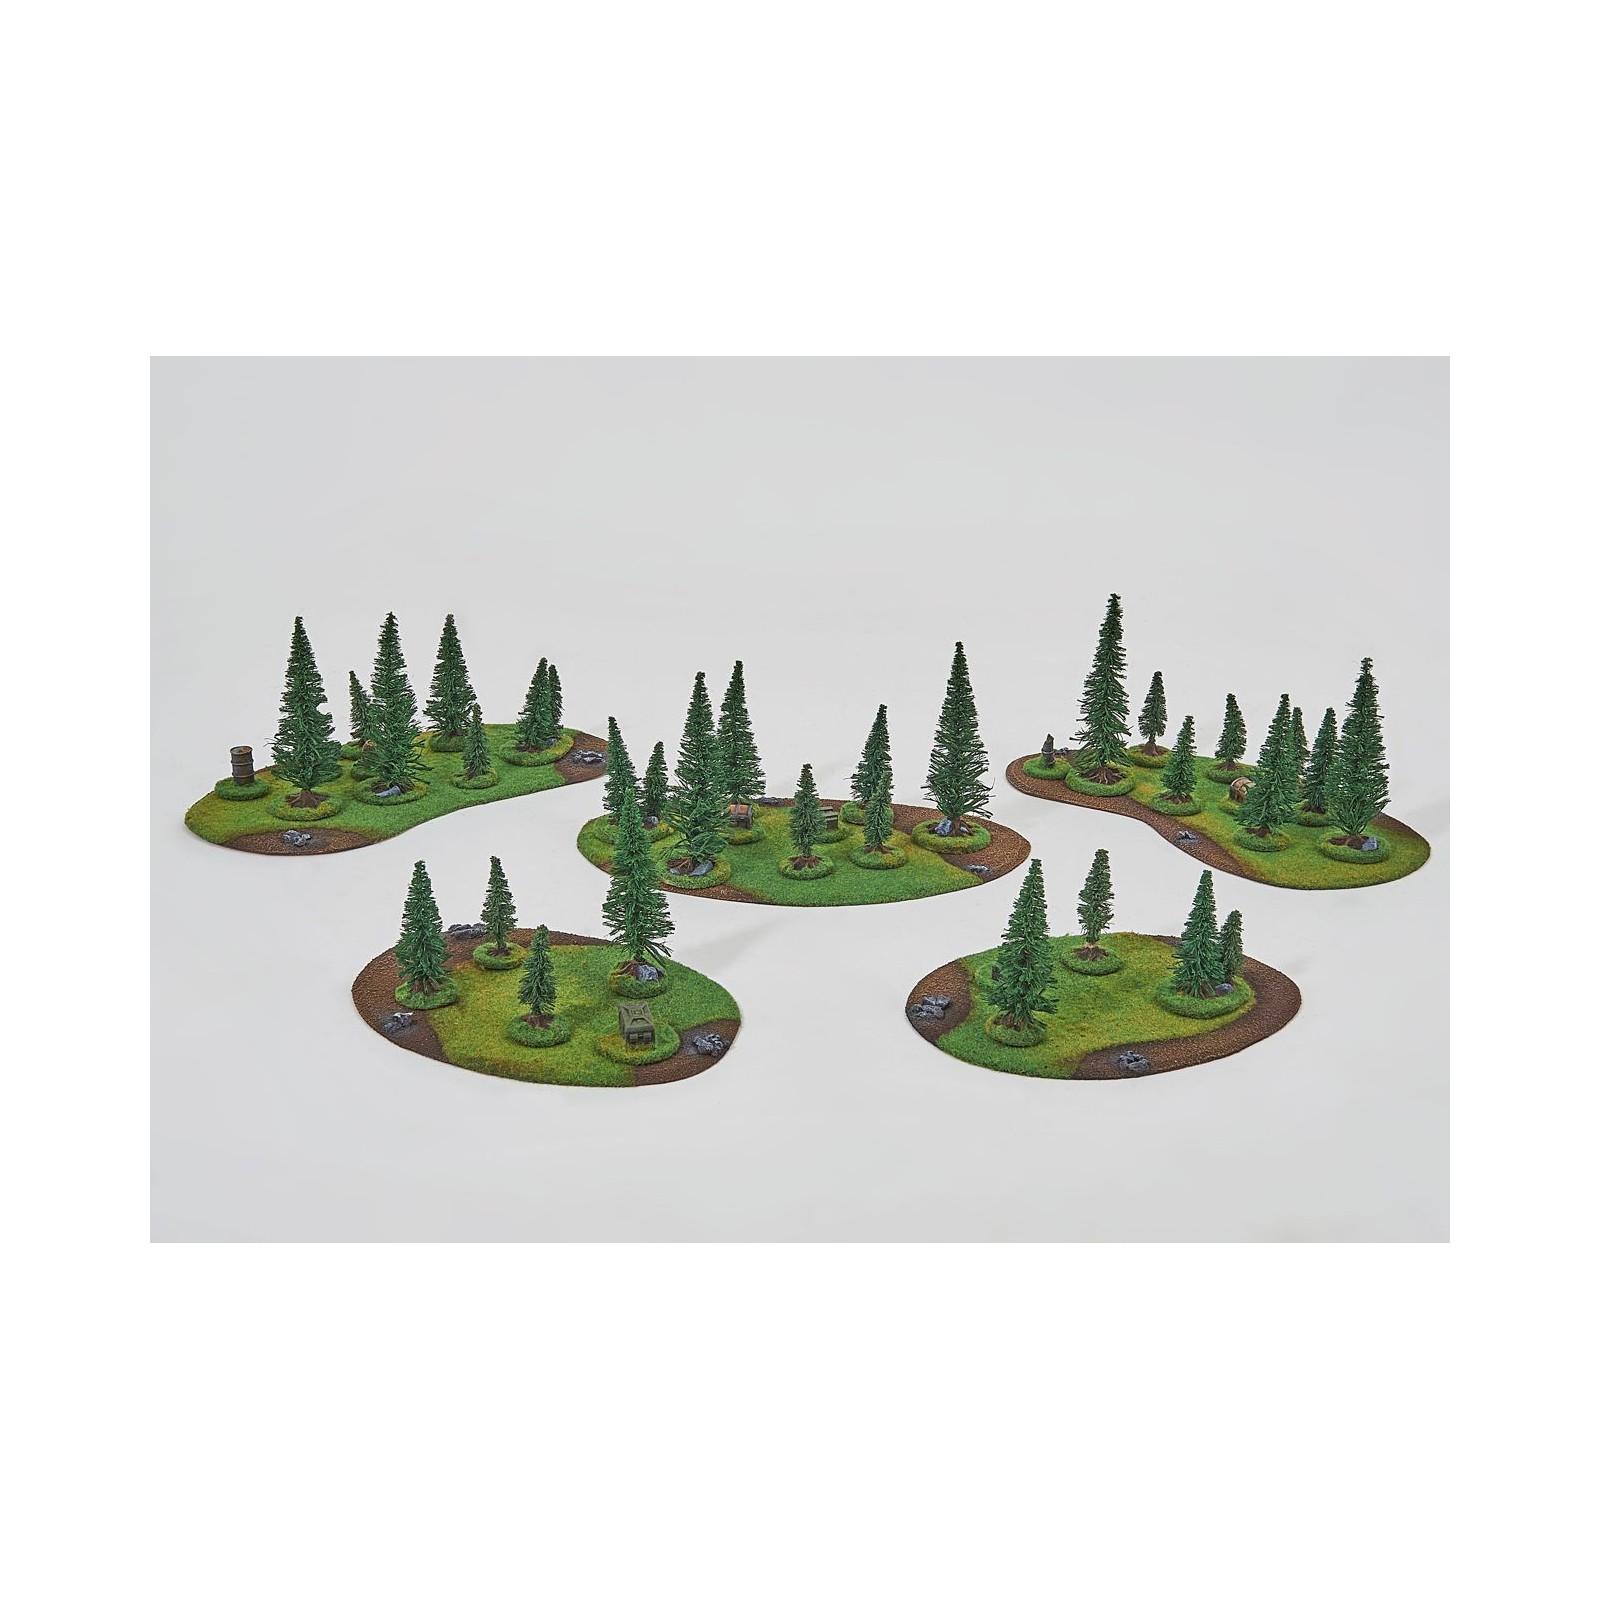 Coniferous FOREST Set - 32 trees